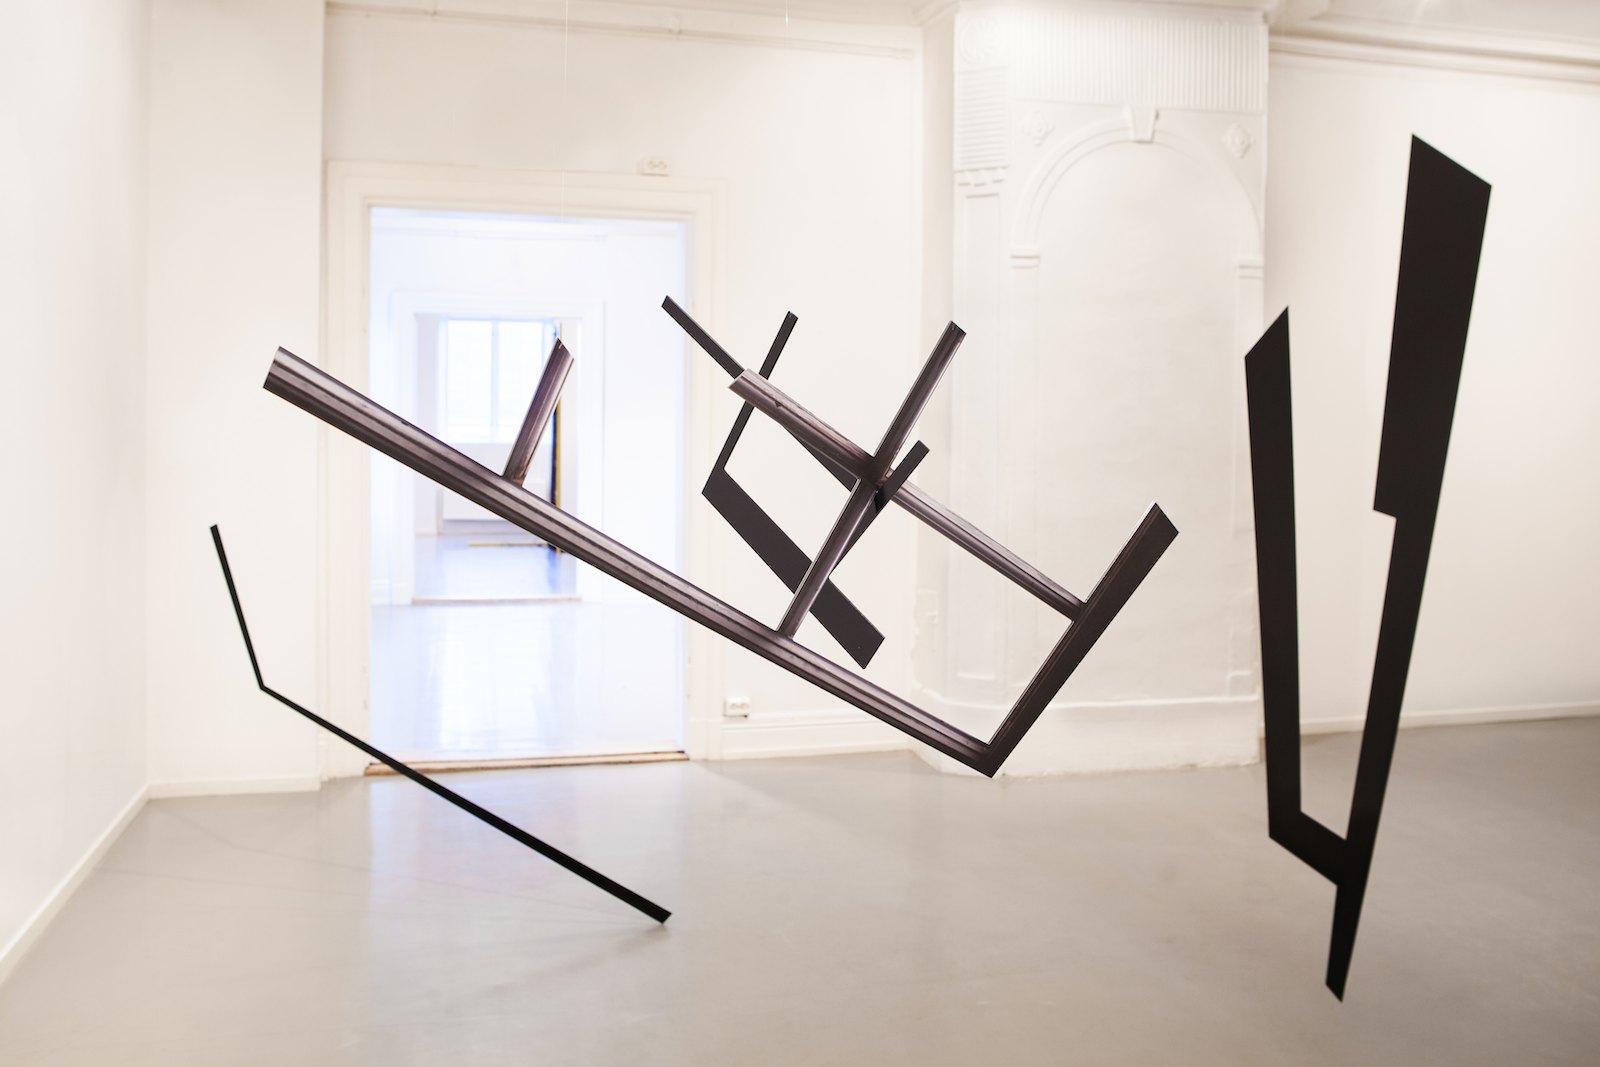 Installation view Marie Buskov 'Second Presence (Leaning, Lying, Hanging, Standing)', Oslo Kunstforening, 2012. Photo: Ellen Jarli